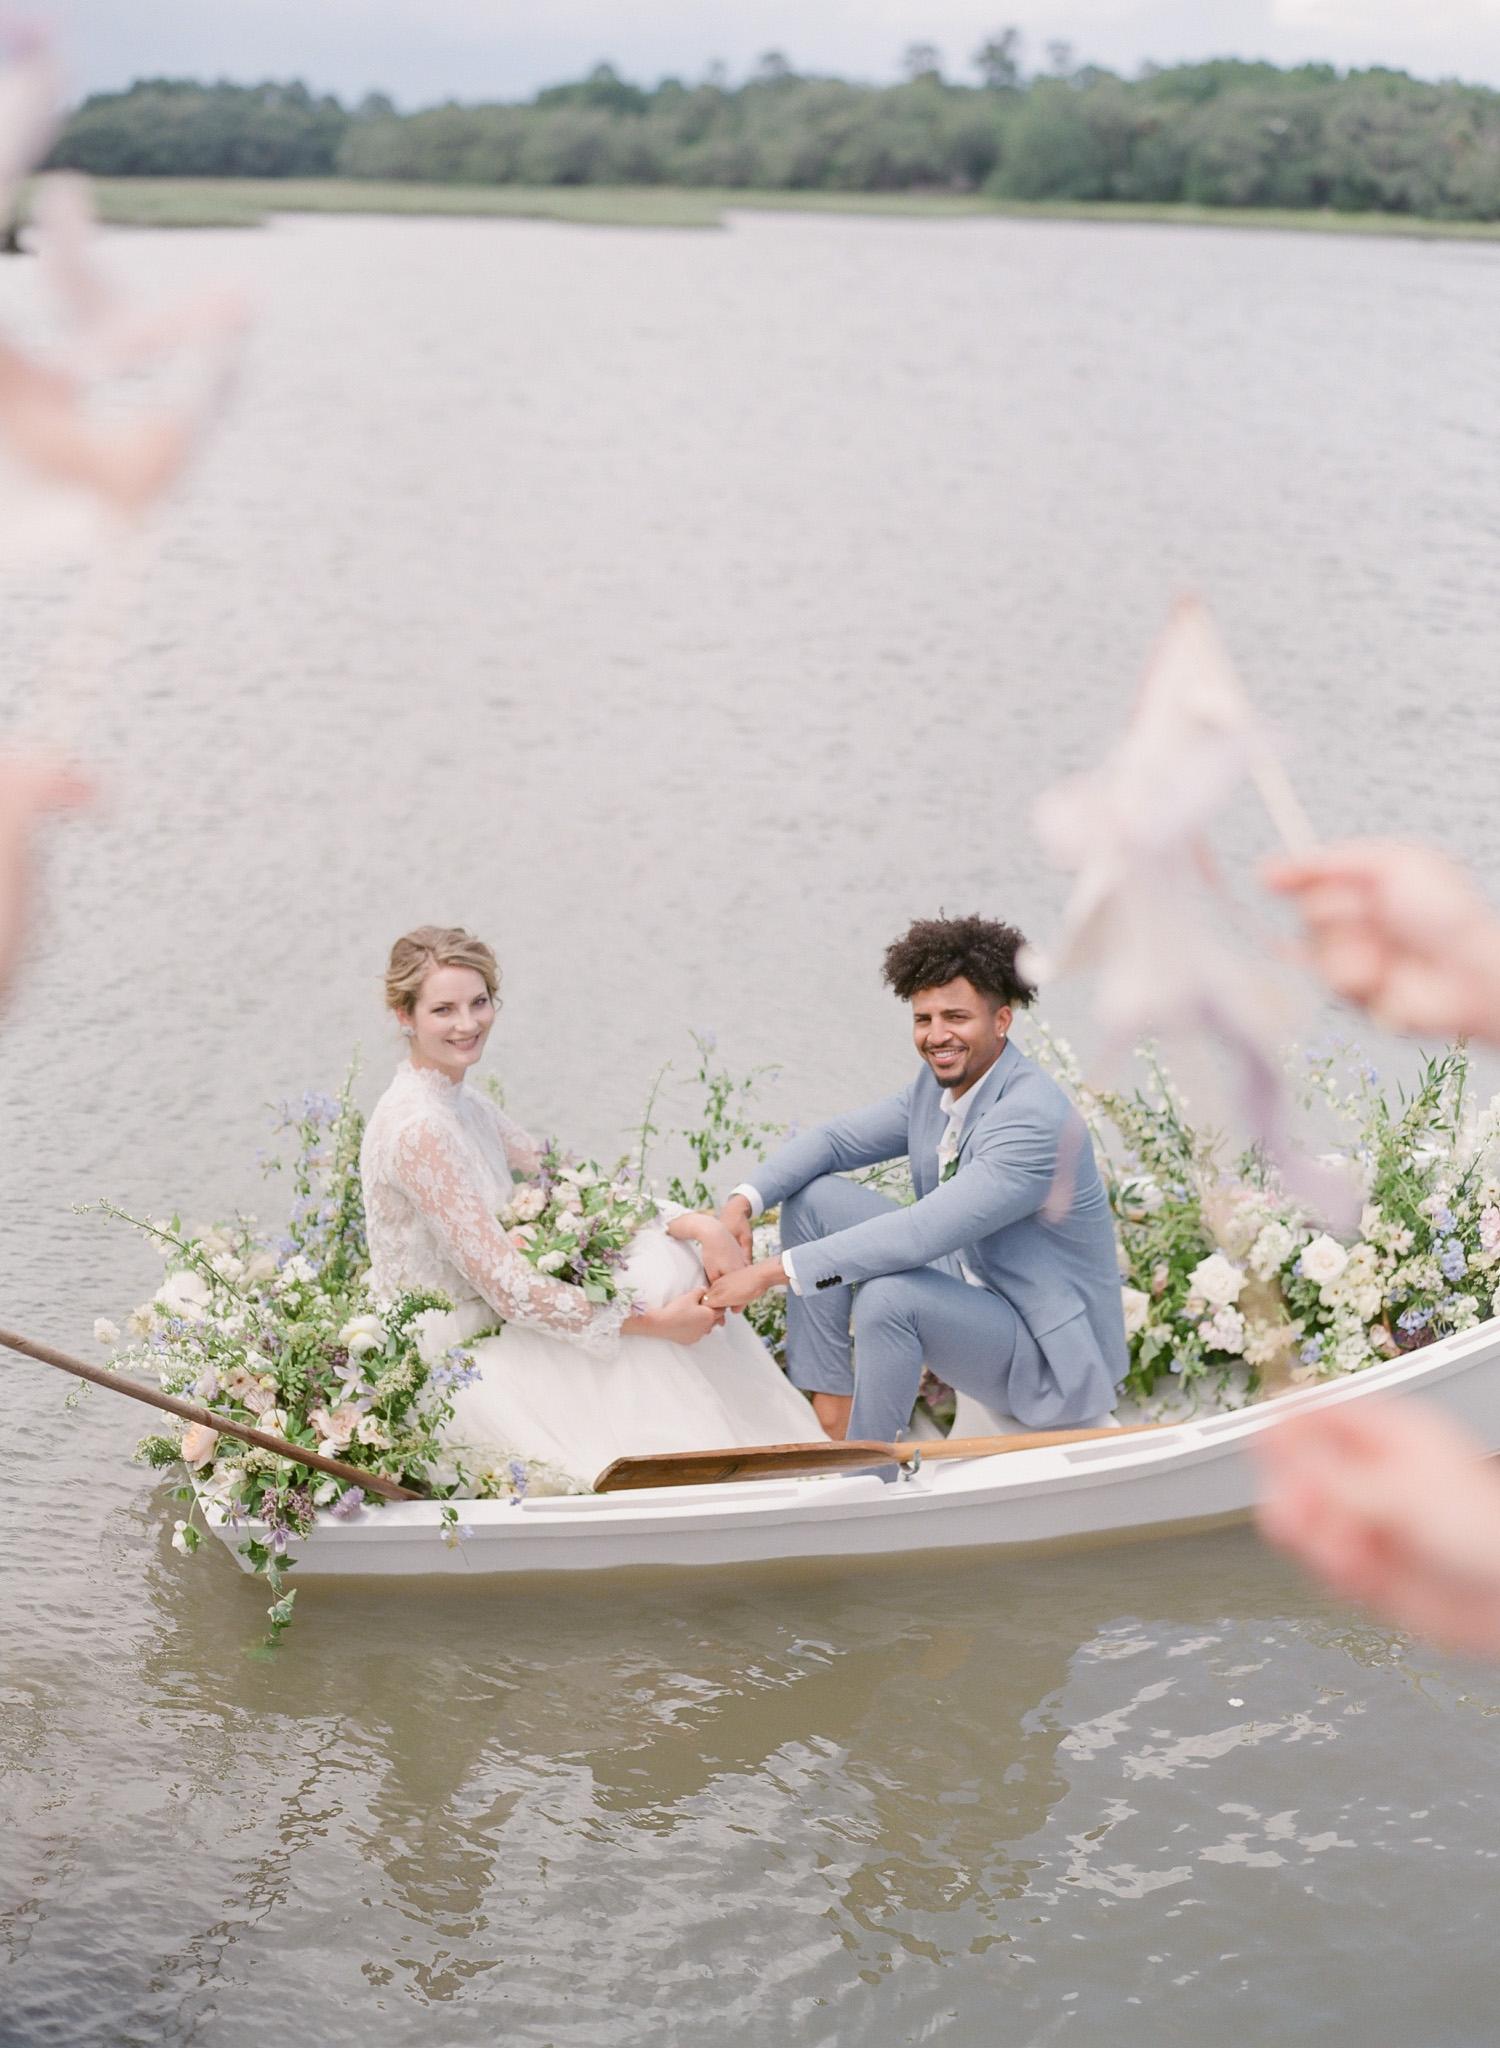 Charleston-Kiawah-River-Weddings-1-6.jpg